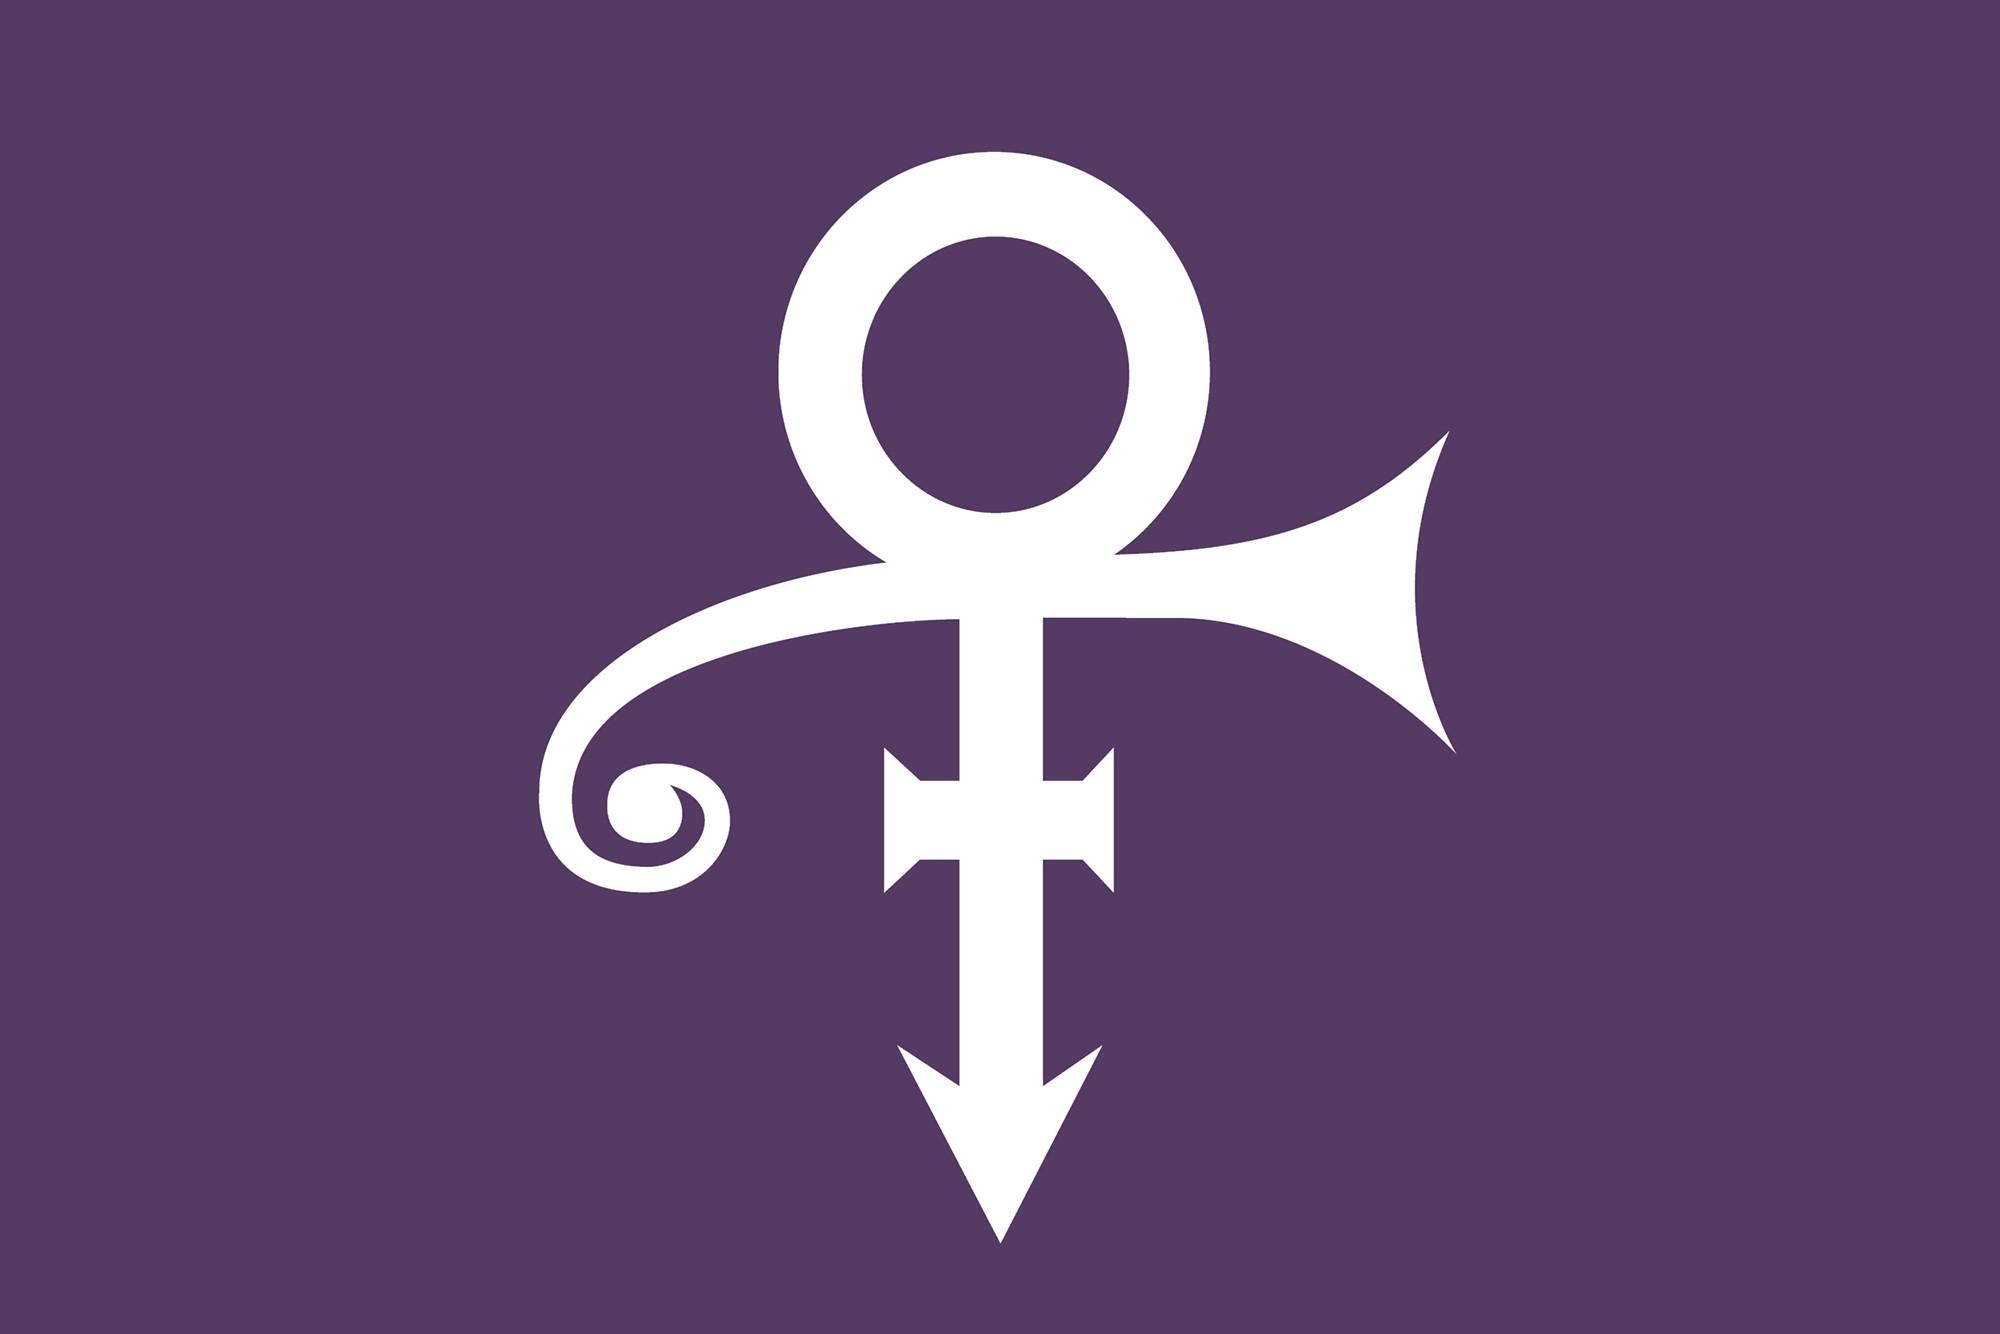 prince symbol wallpaper